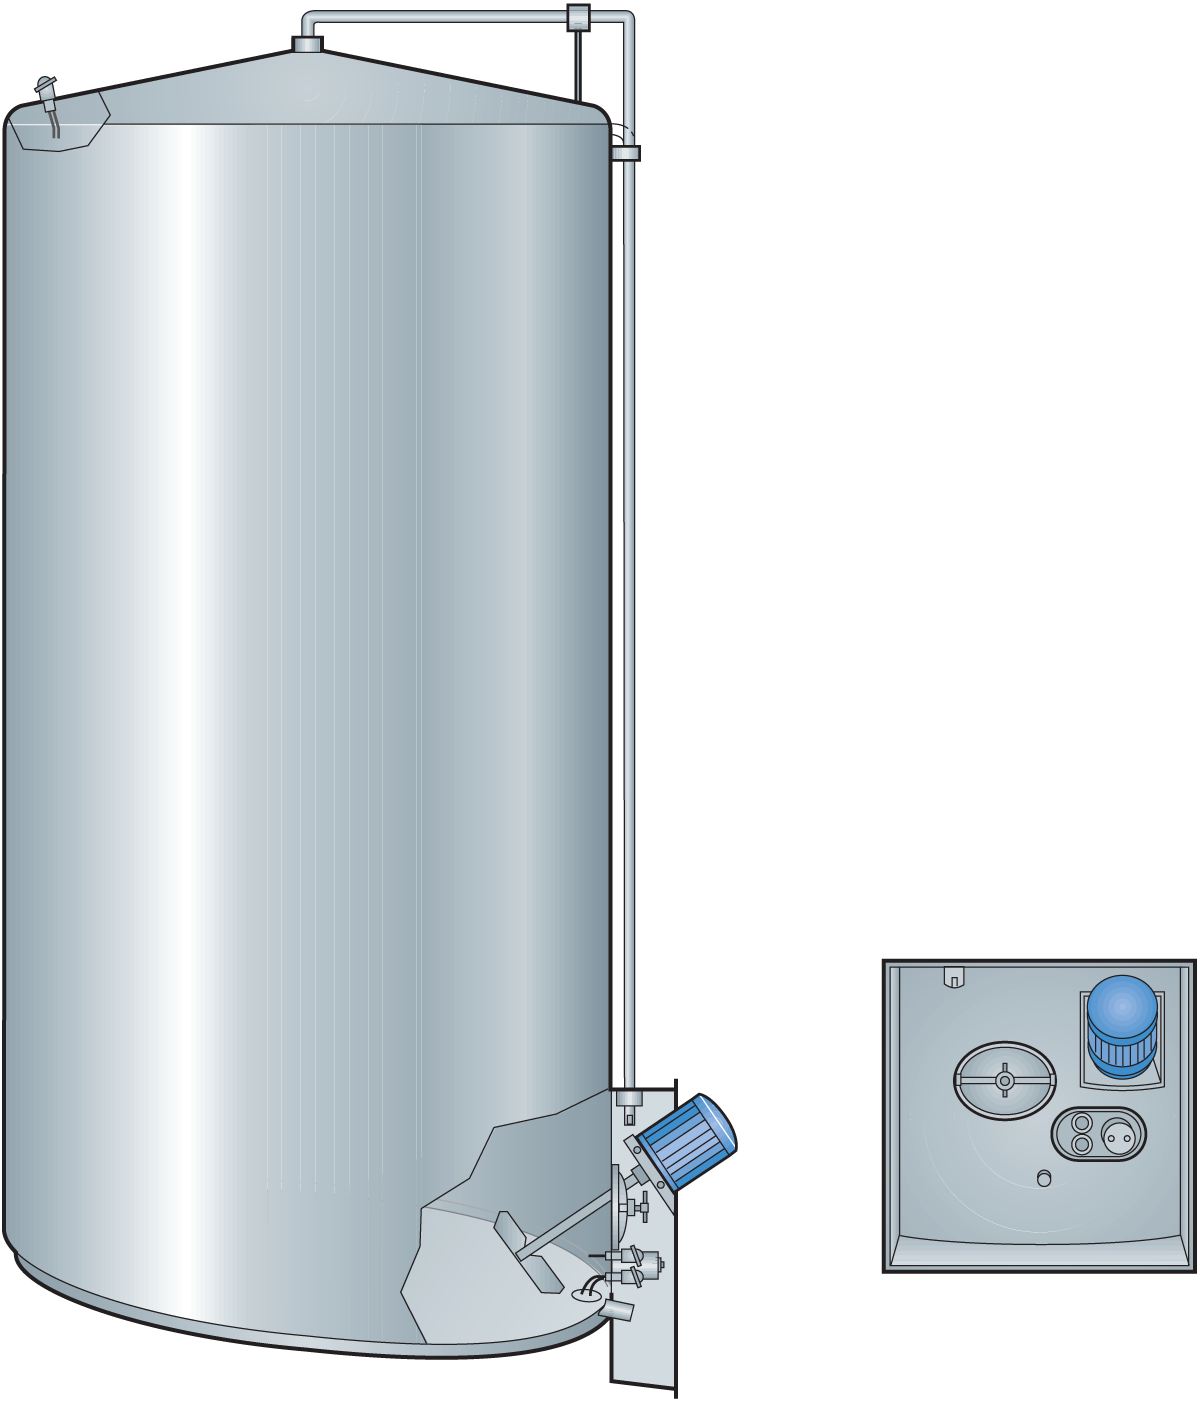 Tanks | Dairy Processing Handbook